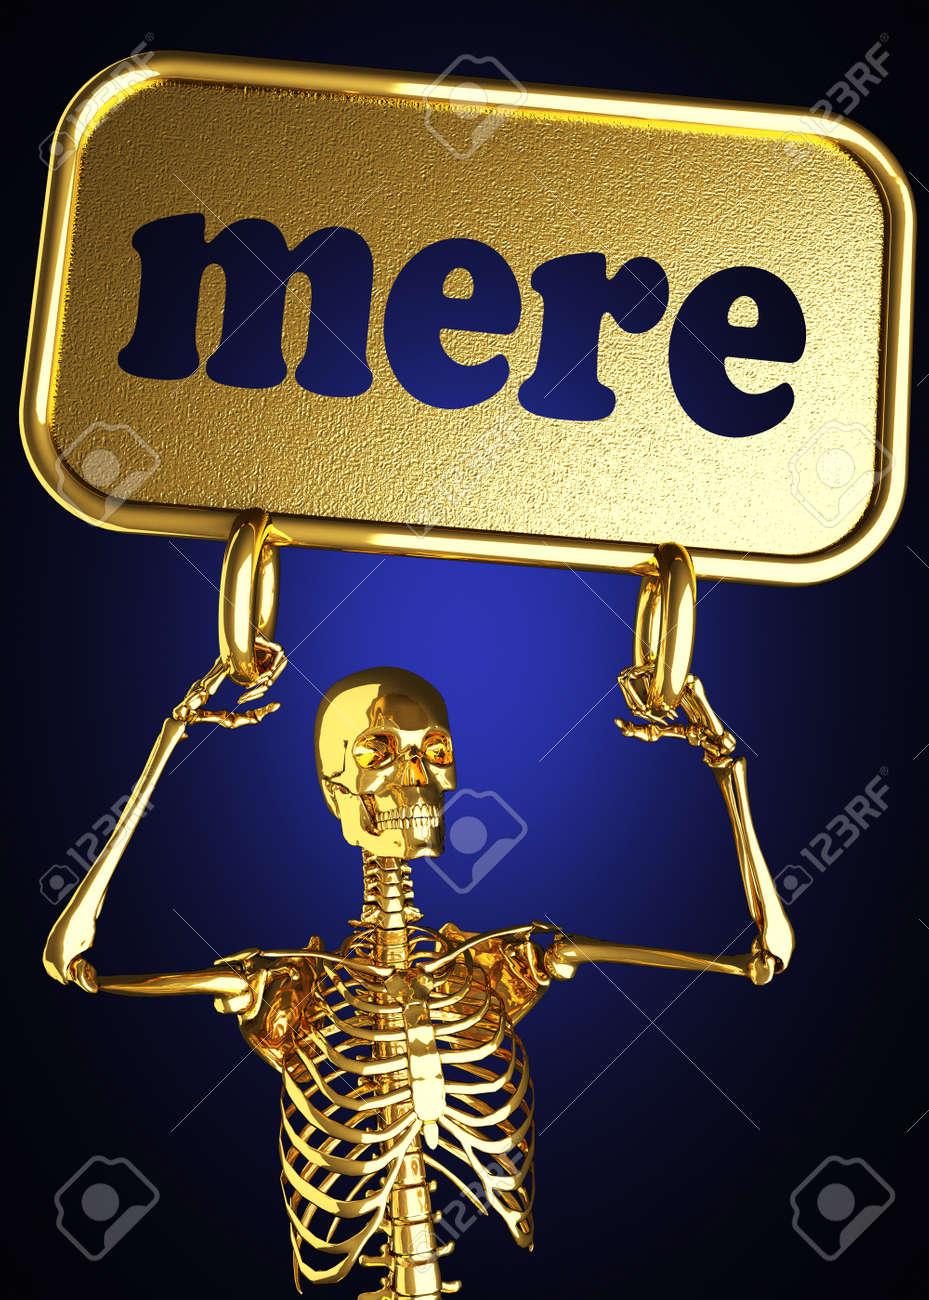 Golden skeleton holding the sign made in 3D - 13444015